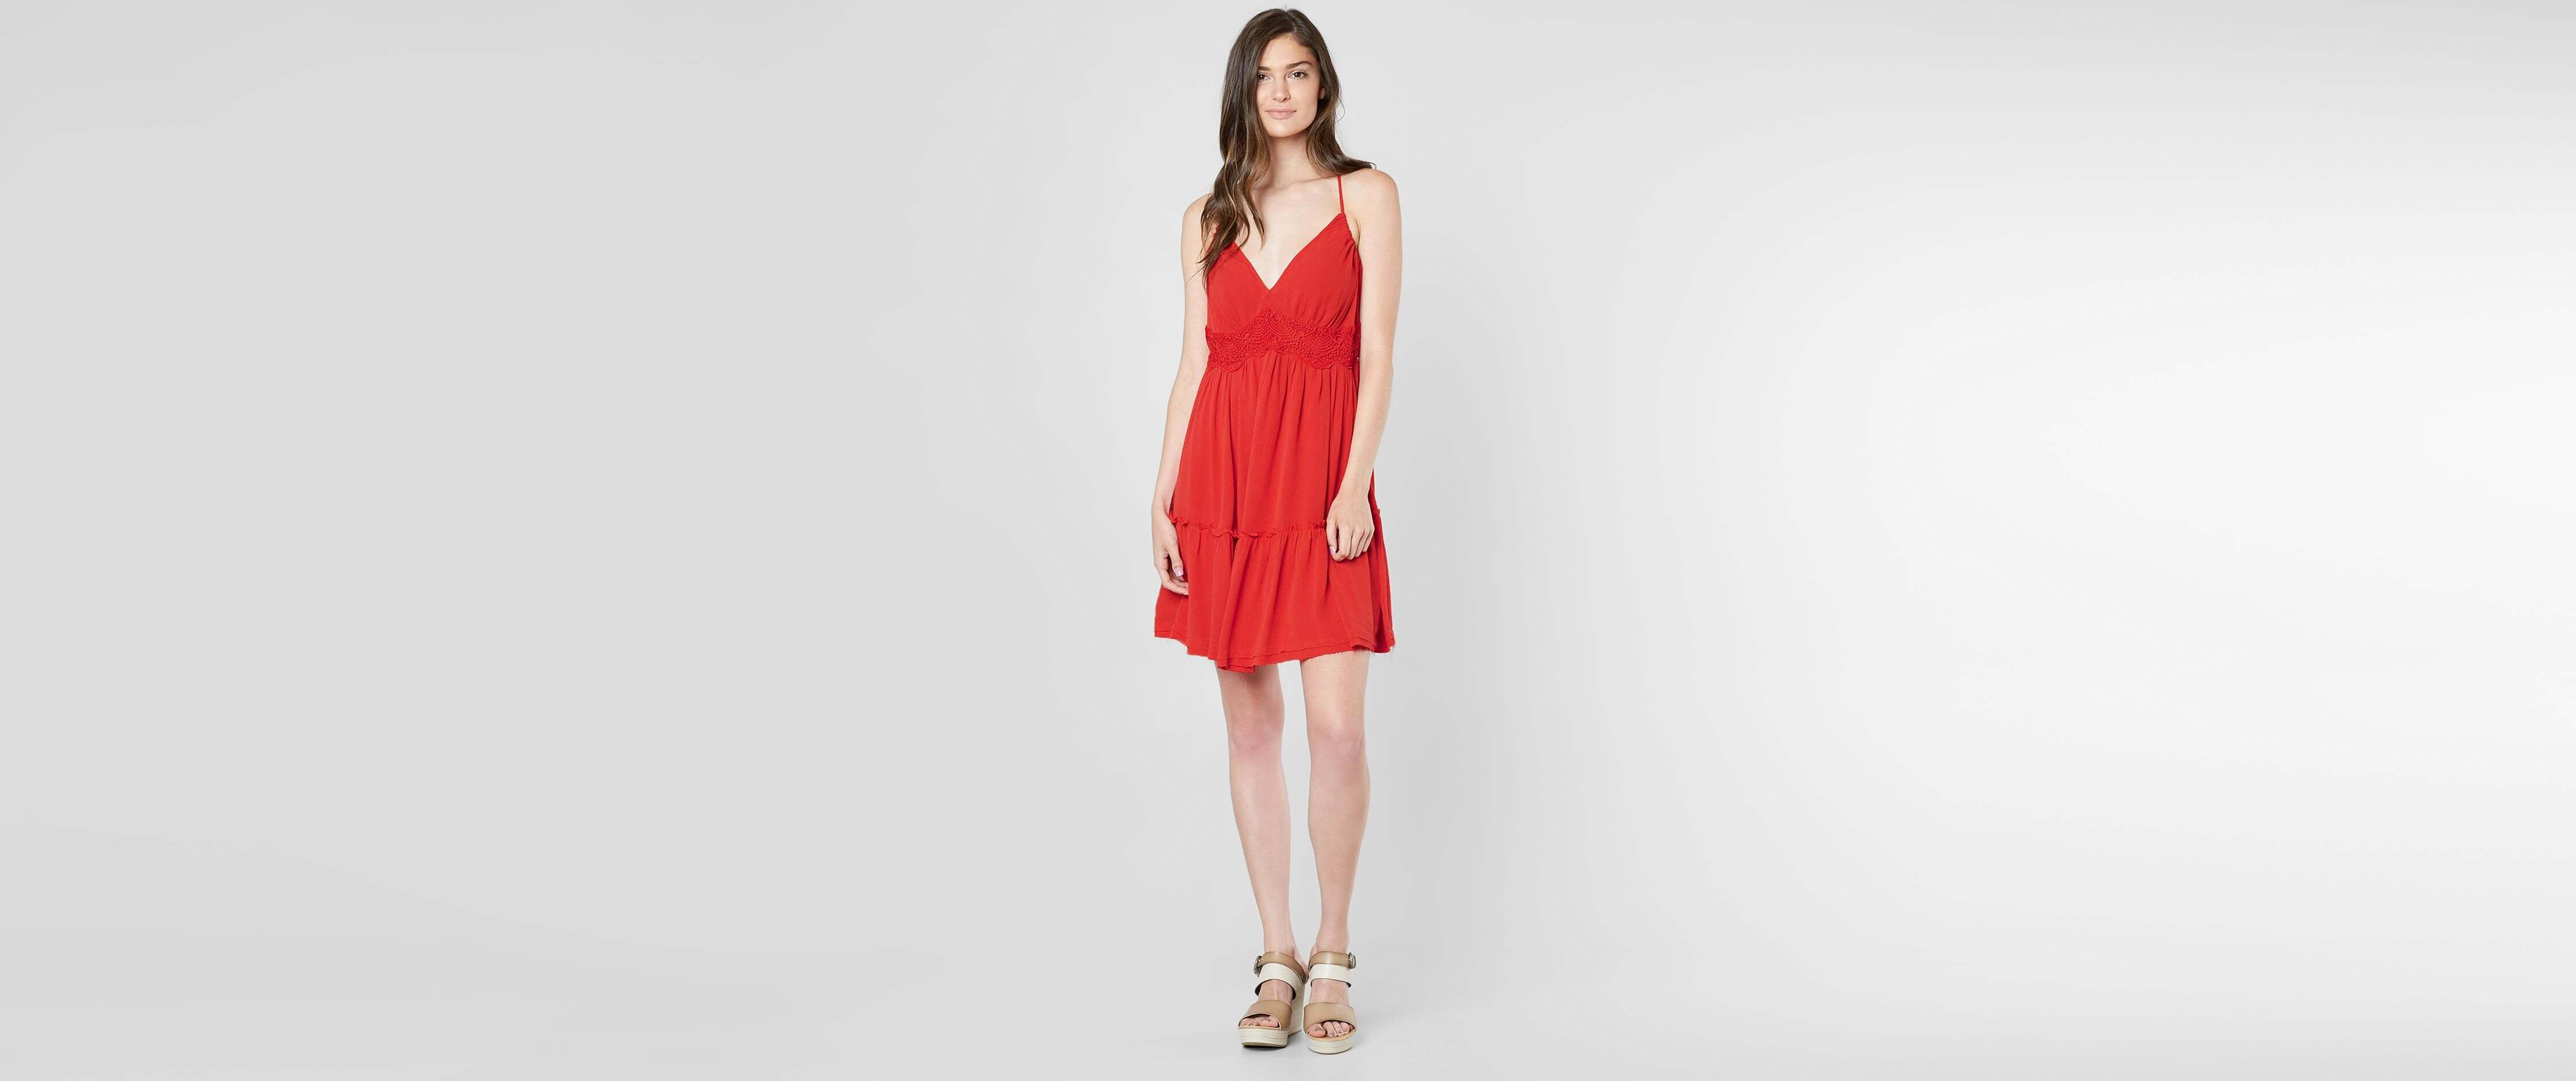 Coco + Jaimeson Woven V-Neck Dress